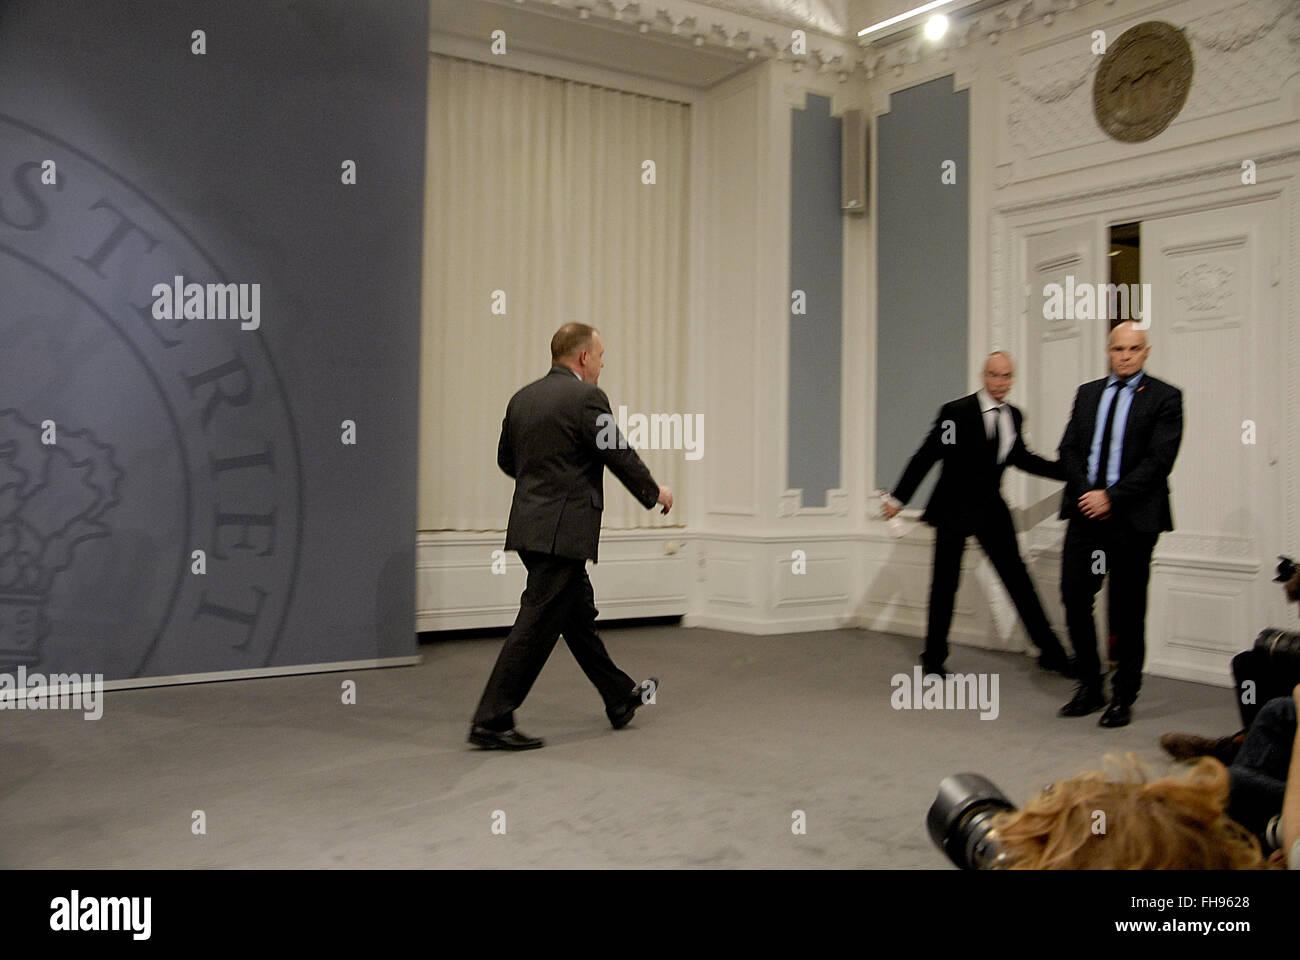 Copenhague, Dinamarca. 24 de febrero de 2016. El primer ministro danés Lars Lokke Rasmussen celebra conferencia Imagen De Stock